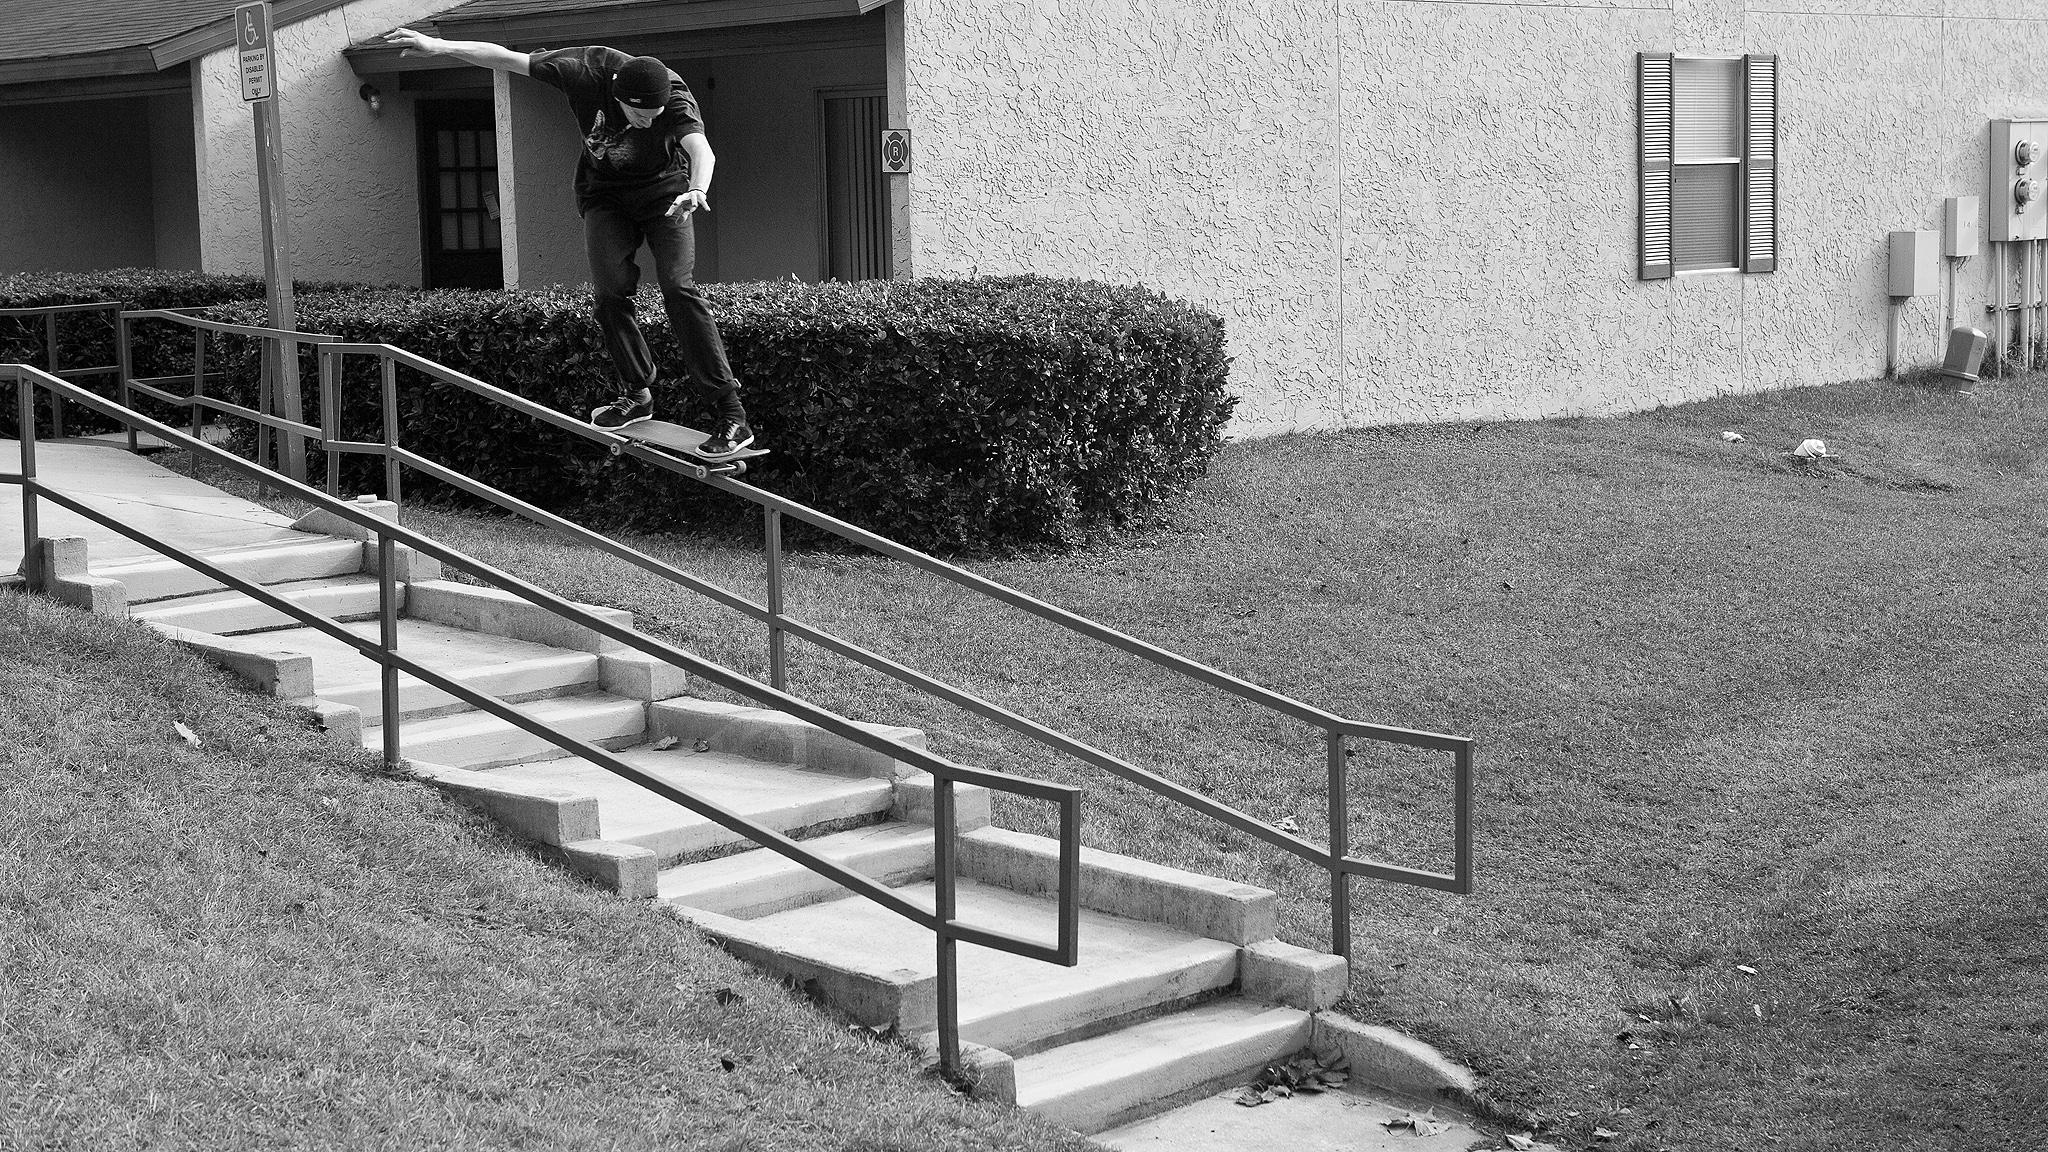 Kevin Shealey